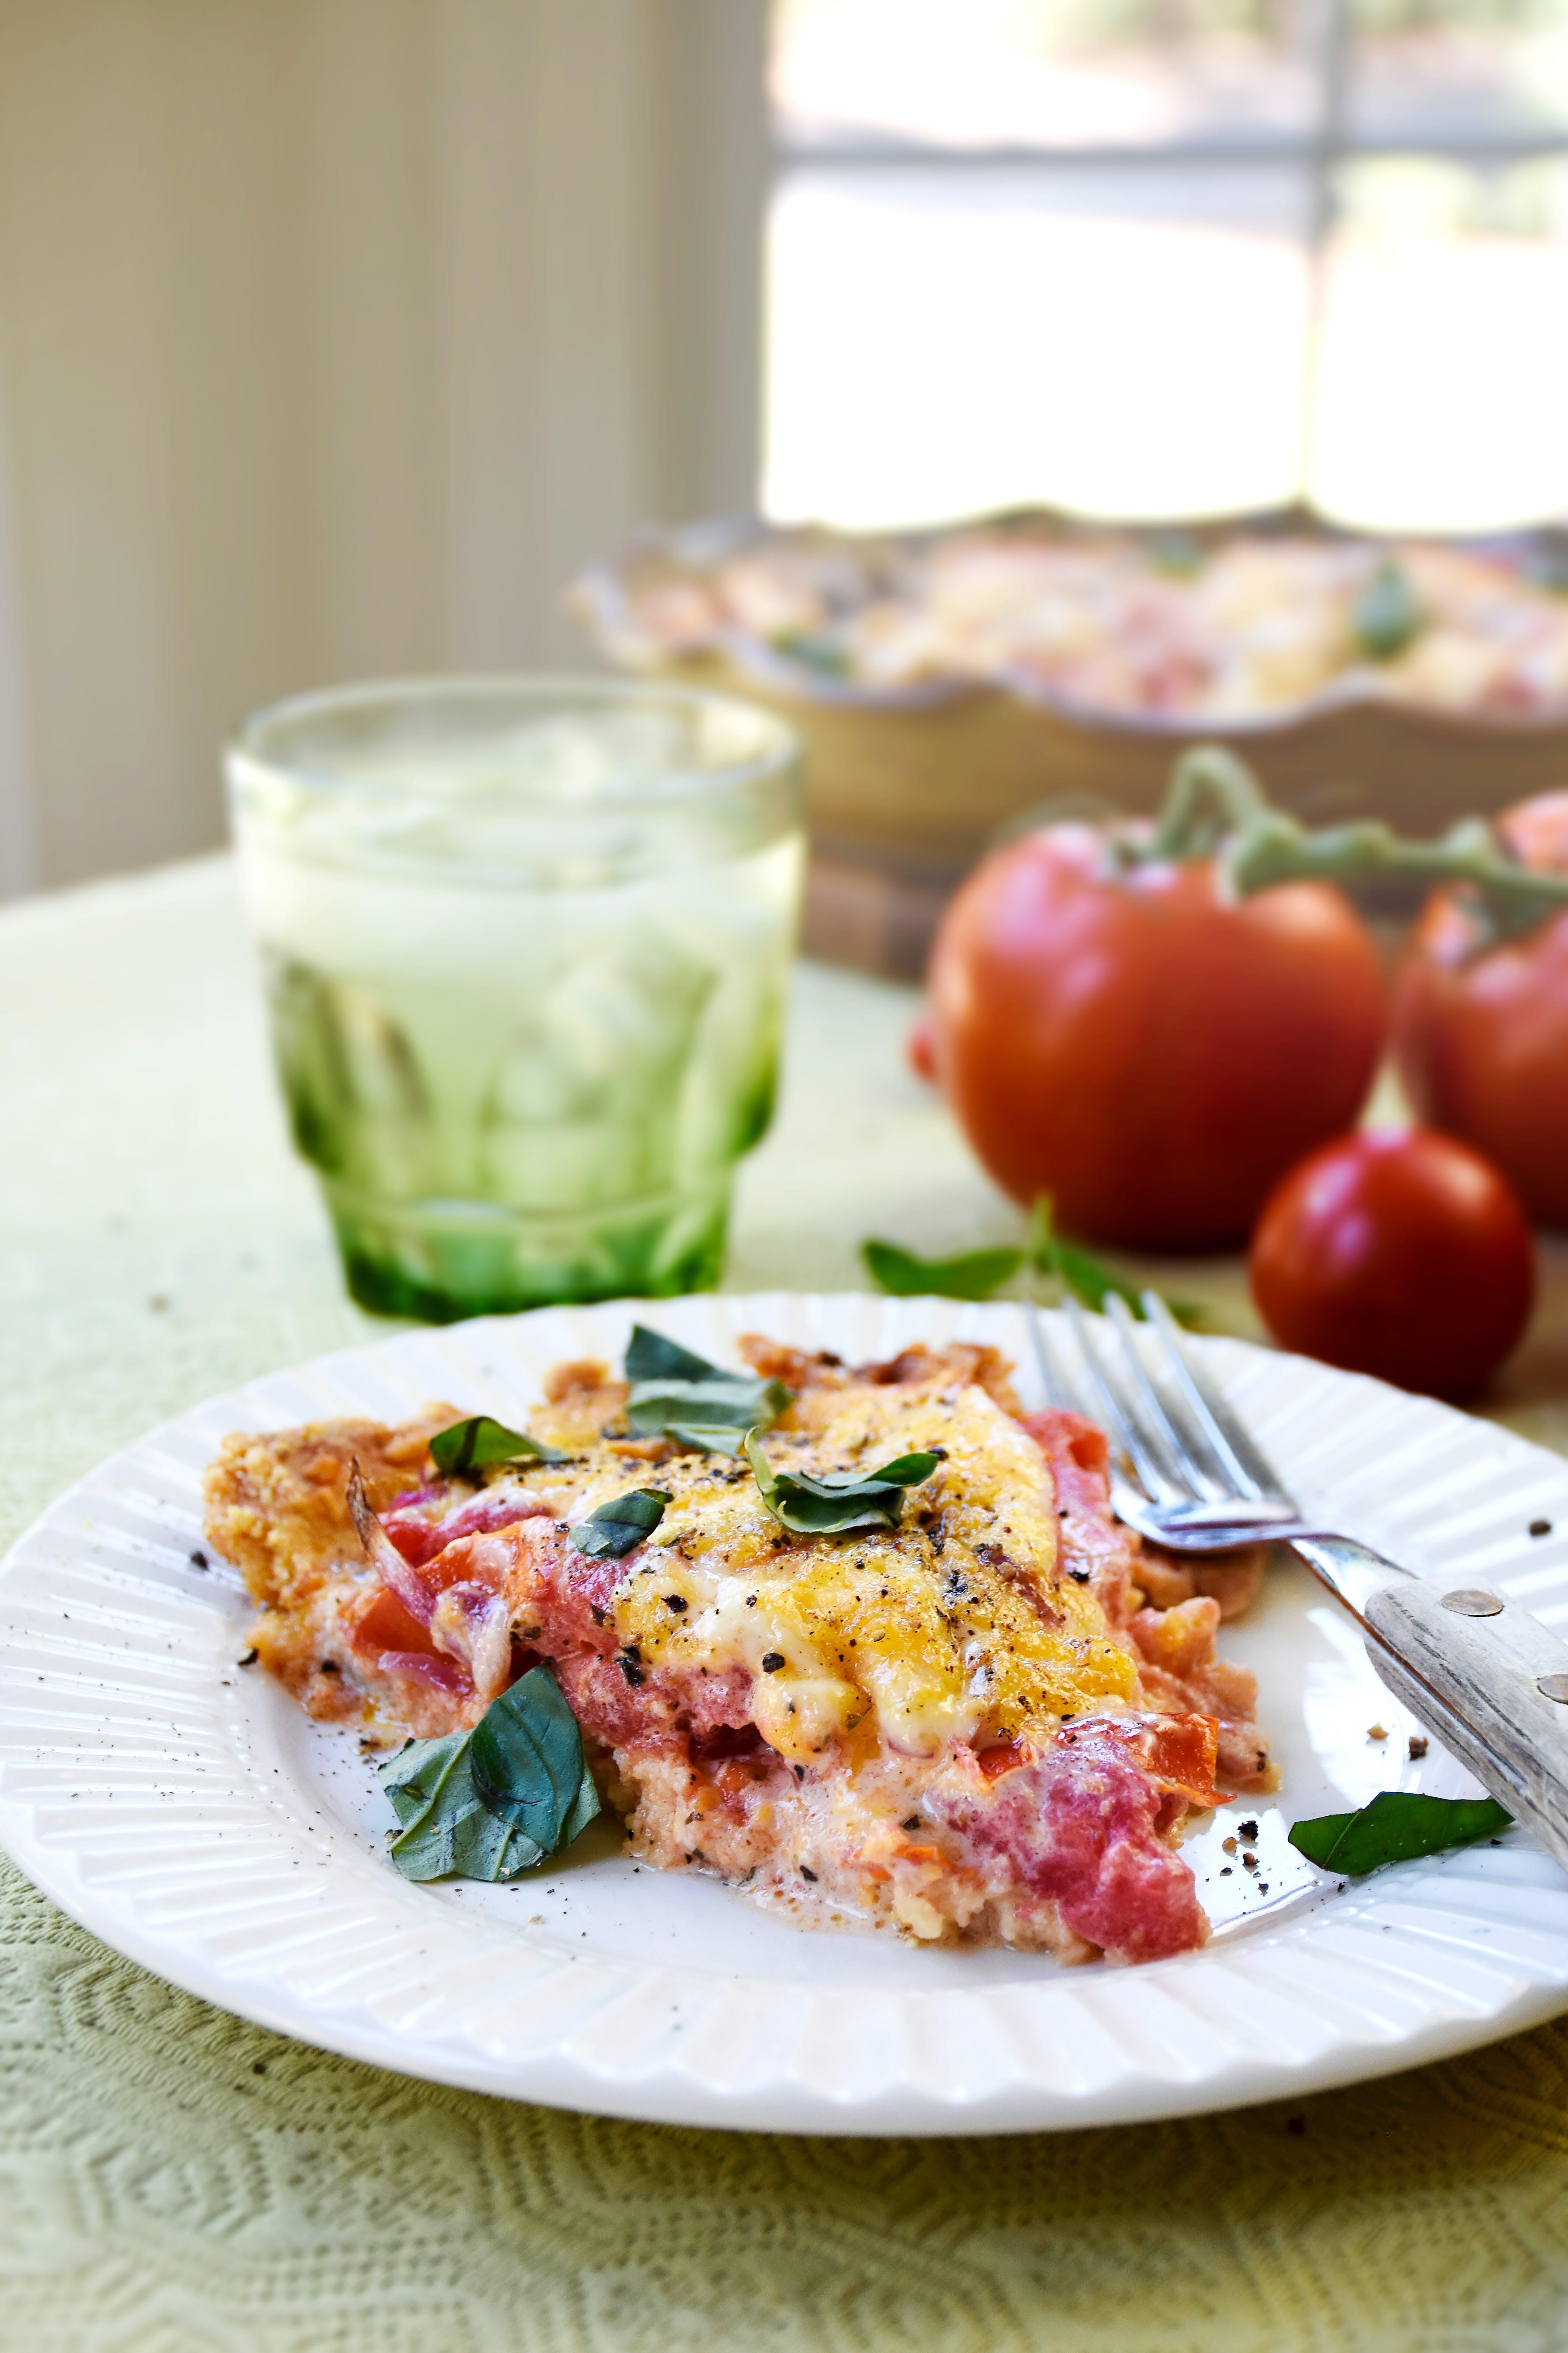 Kristies tomatpaj med parmesan